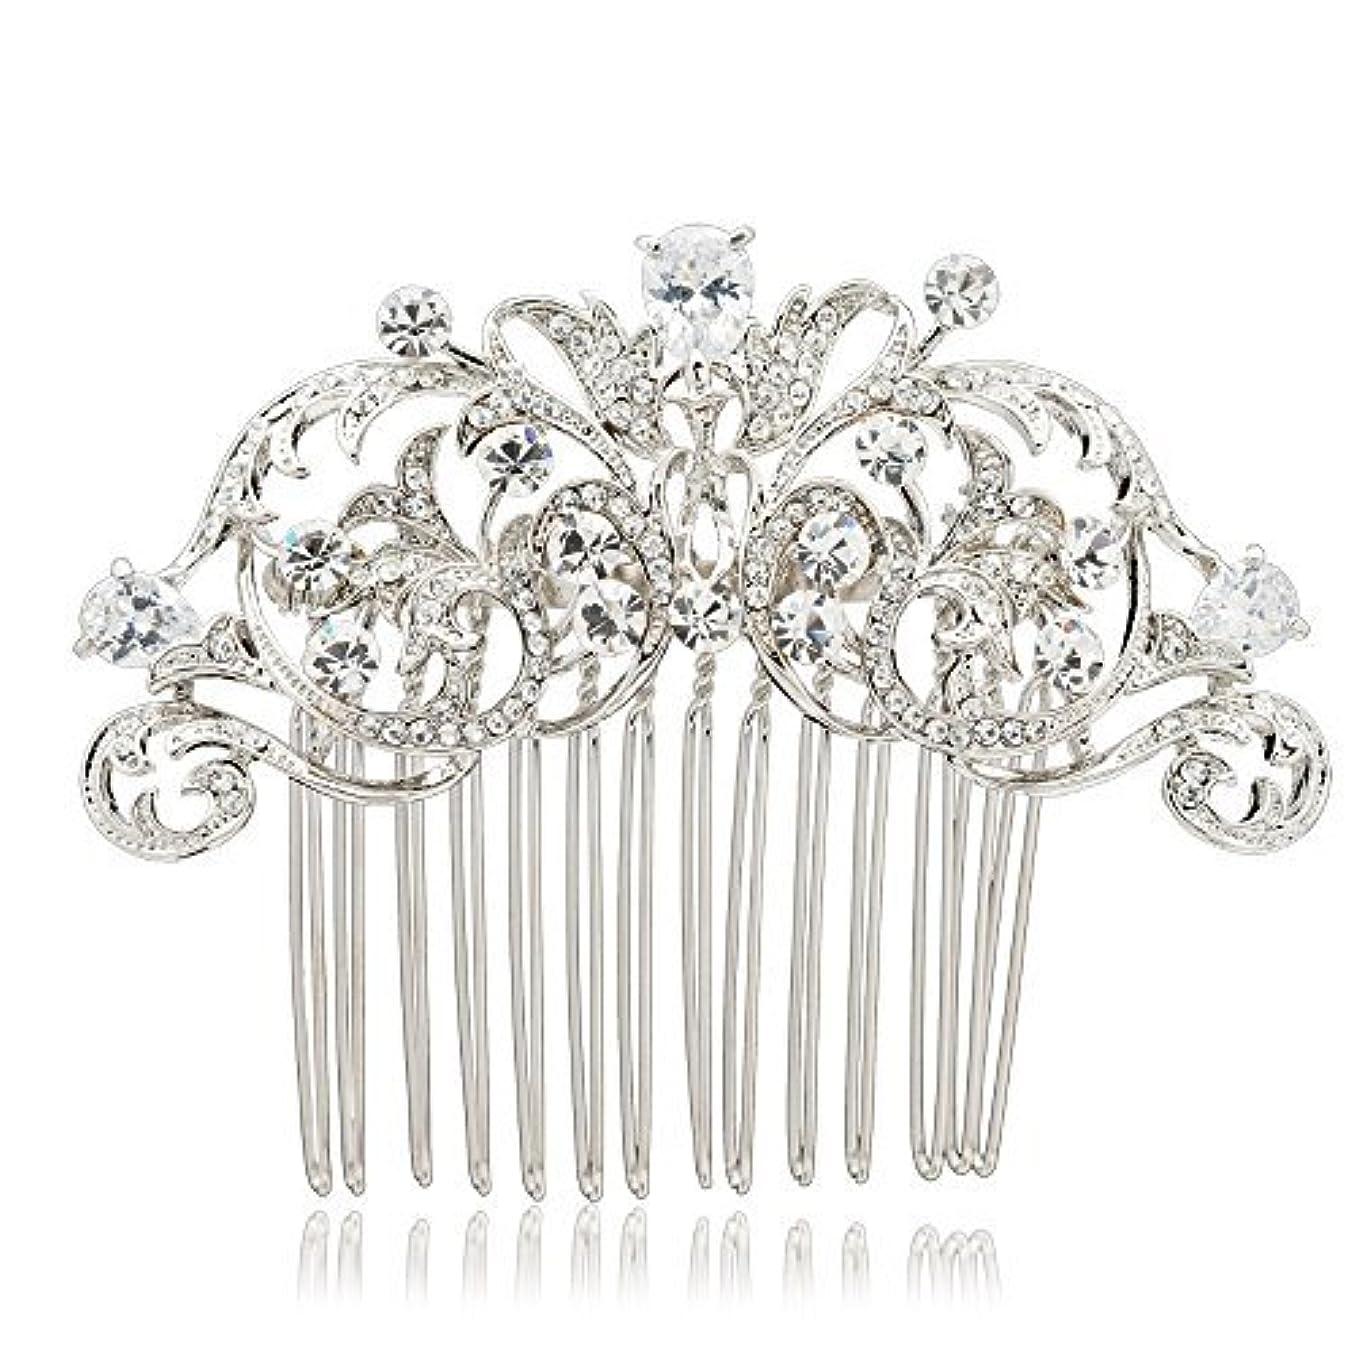 SEPBRIDALS Crystal Rhinestone Hair Side Comb Pins Bridal Wedding Women Hair Accessories Jewelry 2253R [並行輸入品]